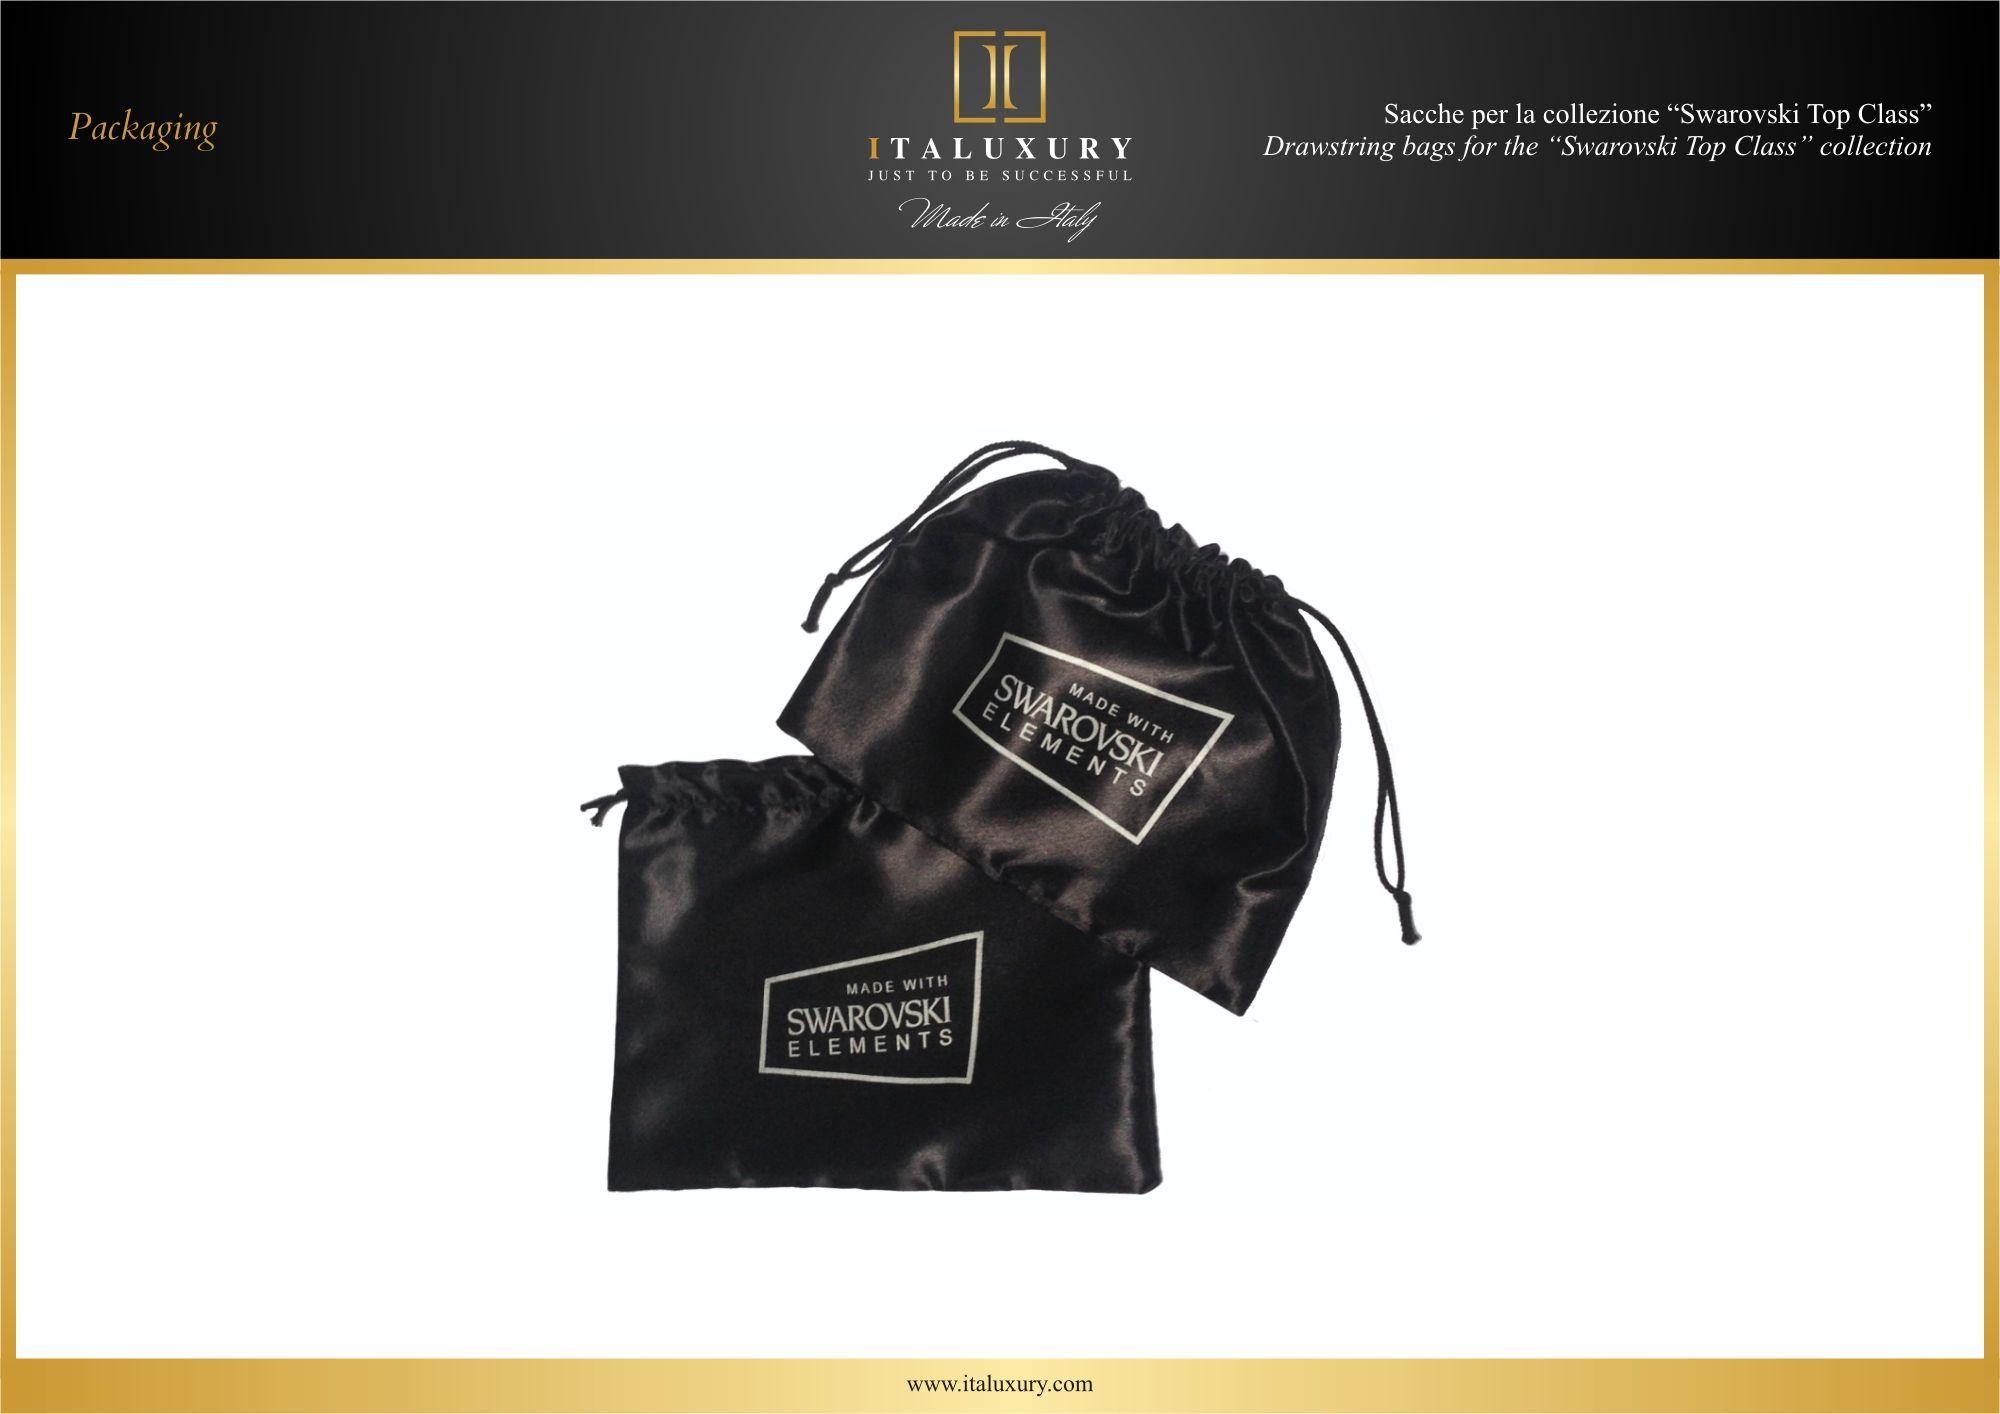 "#Sacche per la collezione ""#Swarovski Top Class"" / #Drawstring #bags for the ""#Swarovski Top Class"" collection by ITALUXURY | #Luxury Leather Goods & Accessories - Made in Italy. Website: www.italuxury.com"